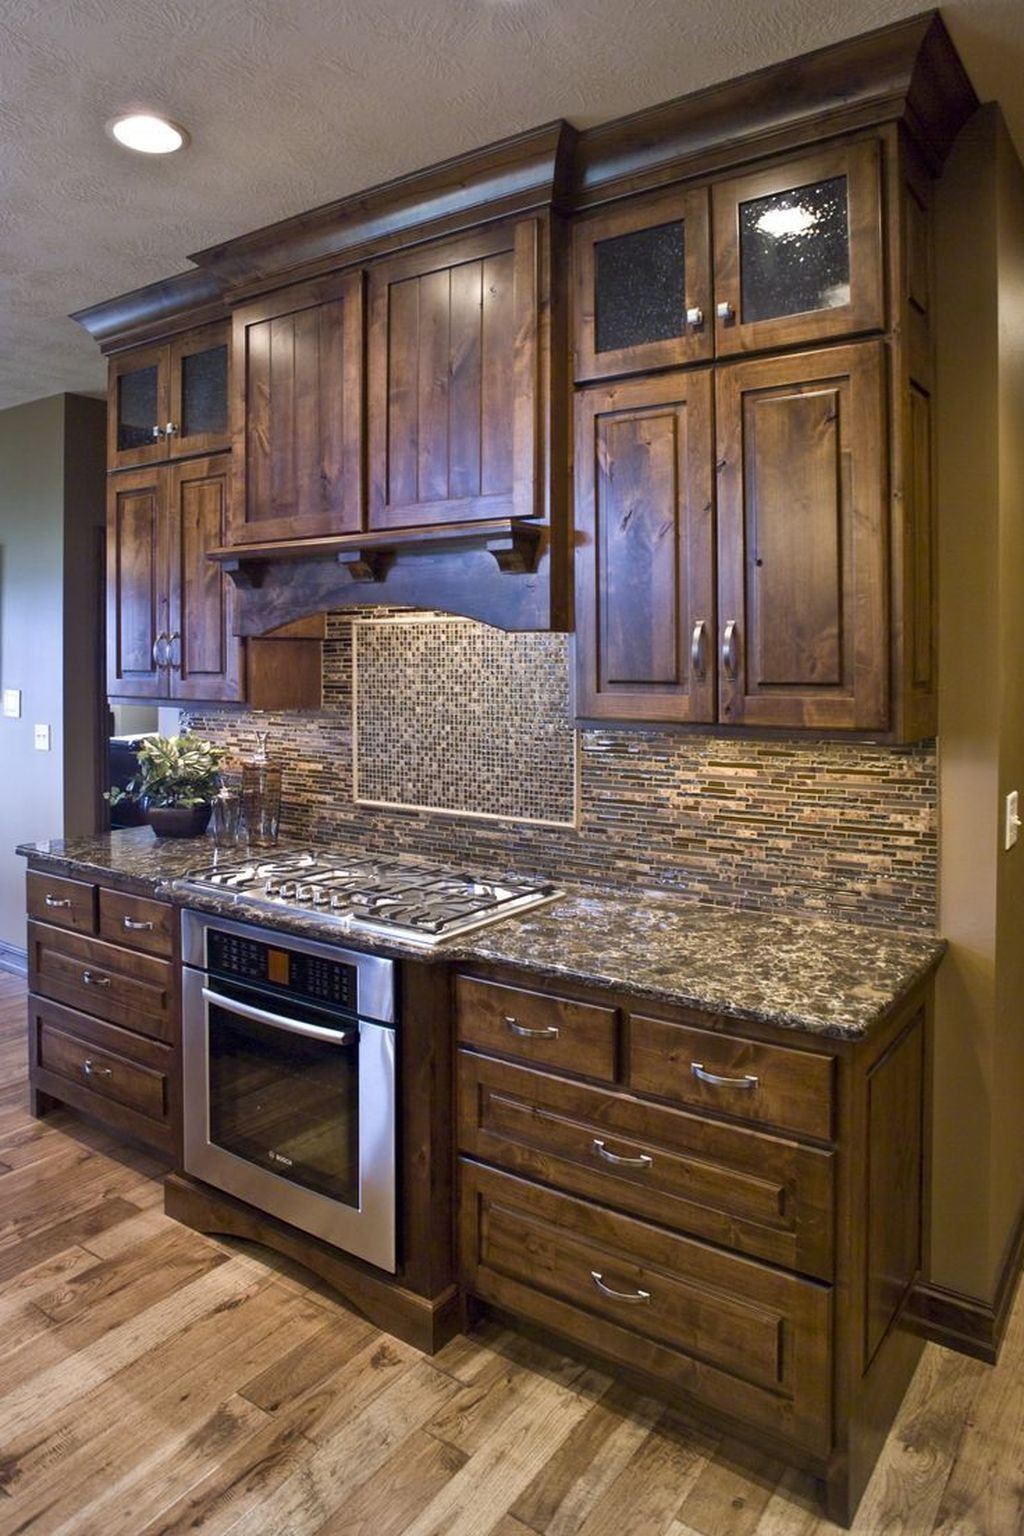 33 Nice Rustic Farmhouse Kitchen Cabinets Design Ideas ... on Rustic:yucvisfte_S= Farmhouse Kitchen Ideas  id=39928